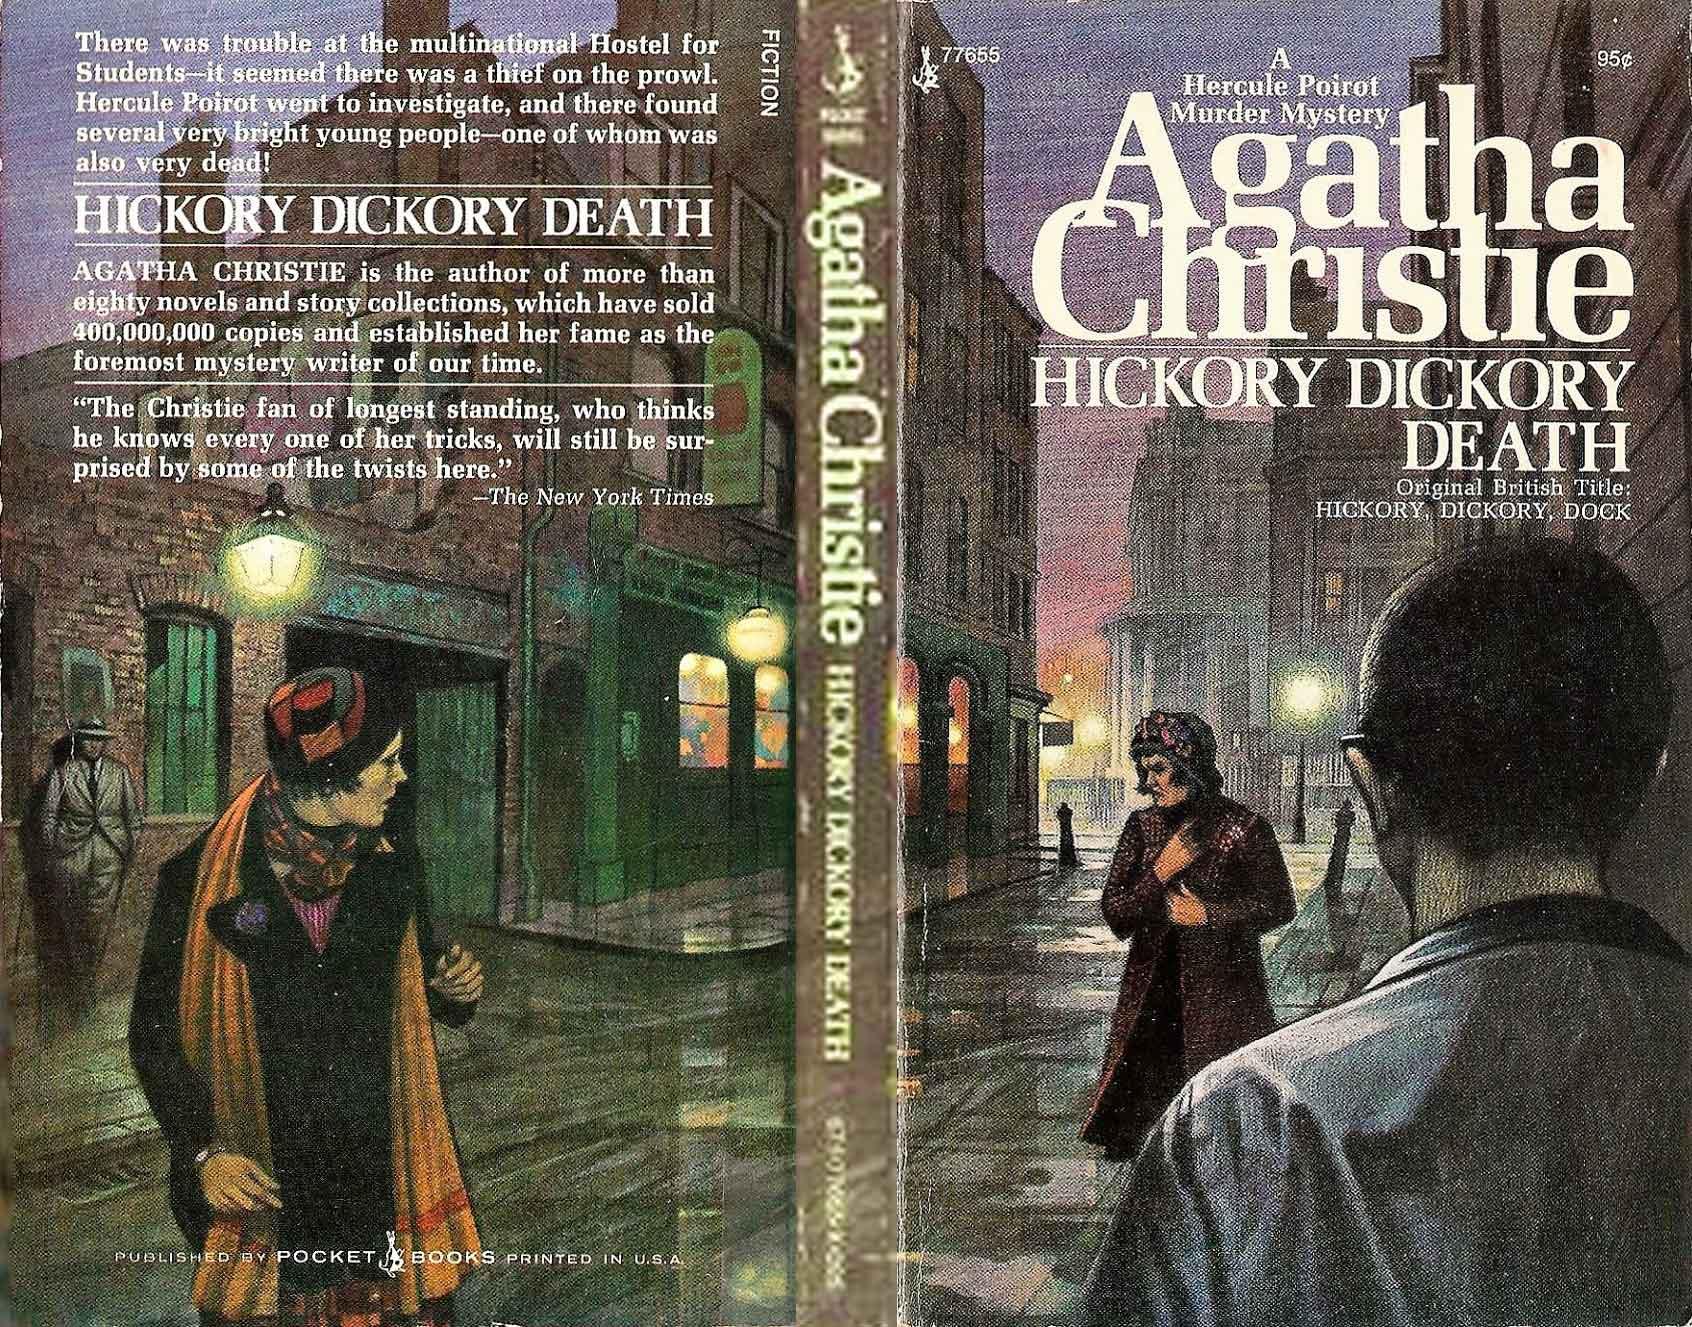 Agatha Christie Tom Adams Hickory Dickory Dock Pocket sm